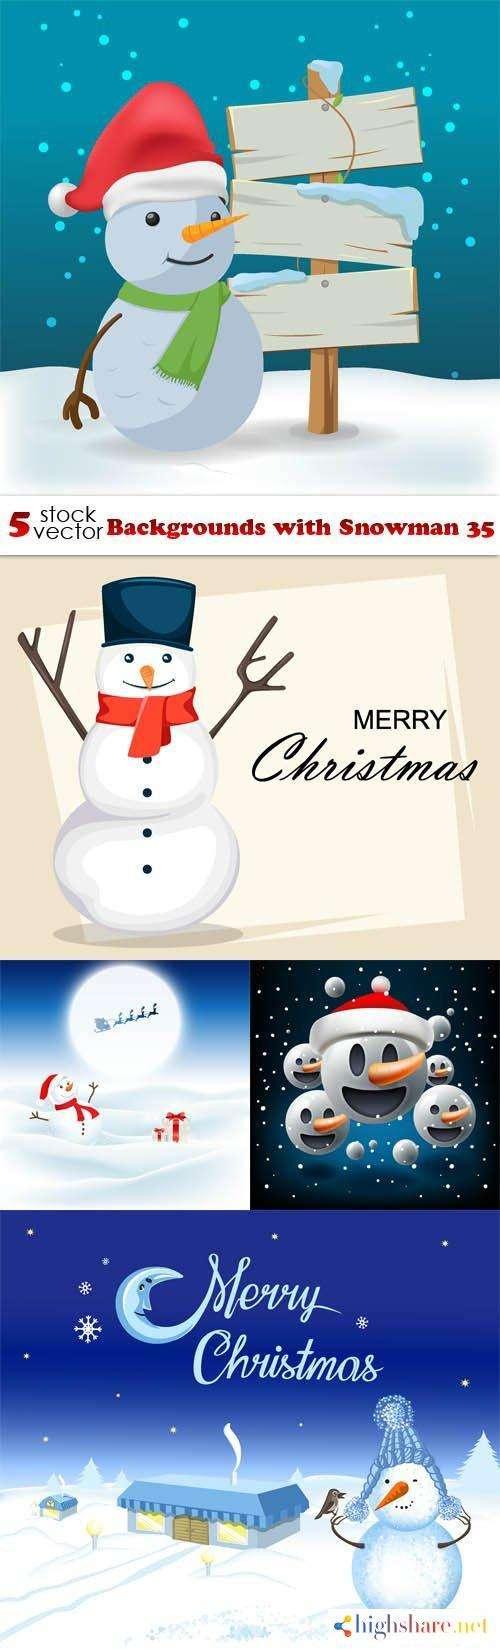 vectors backgrounds with snowman 35 5f439d376dd8f - Vectors - Backgrounds with Snowman 35